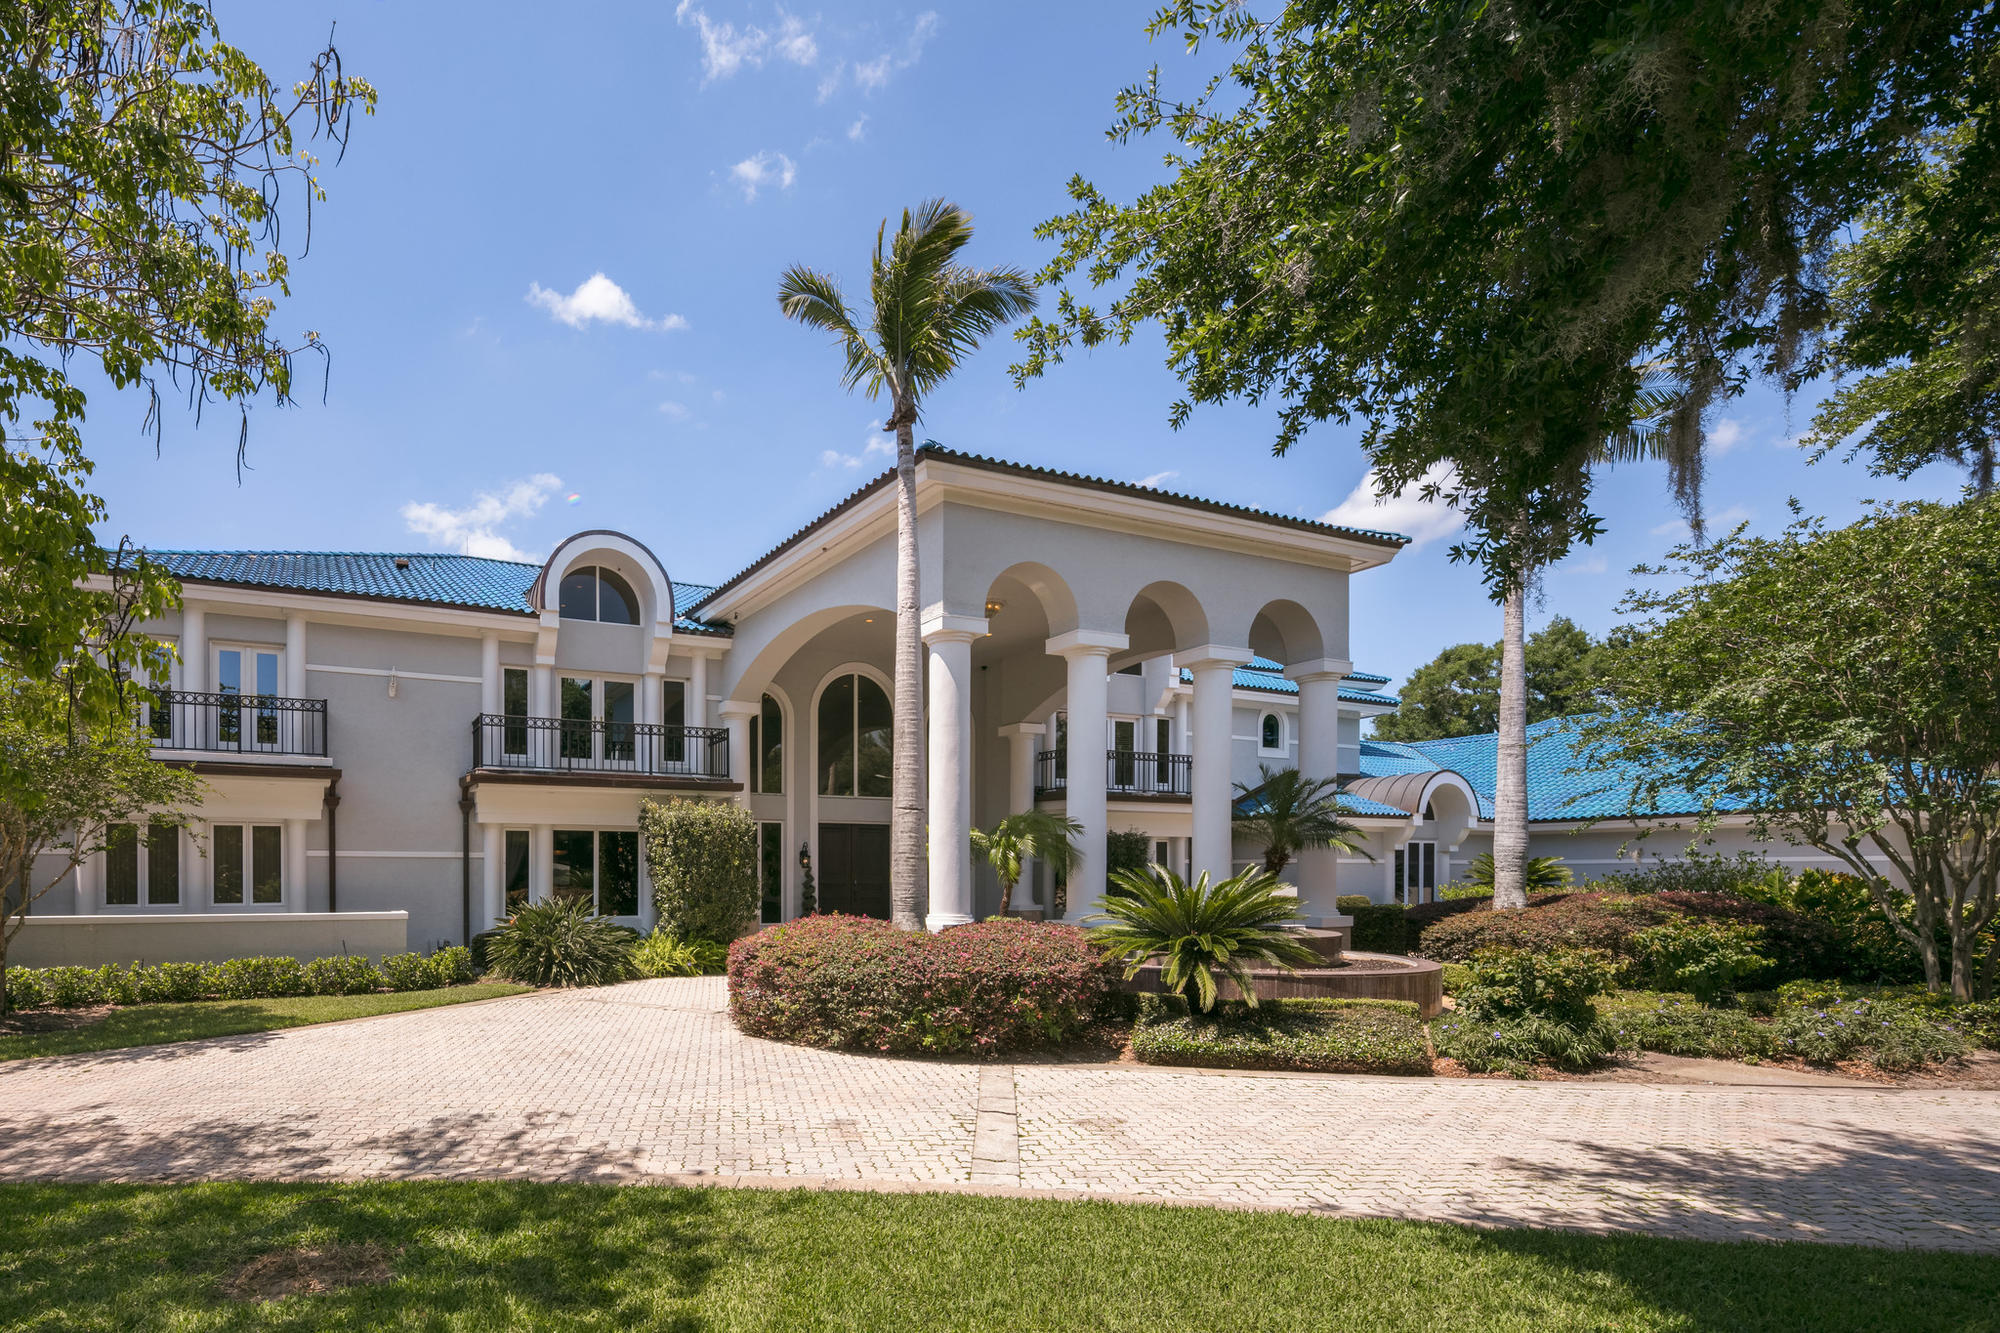 Comprar casa nos EUA